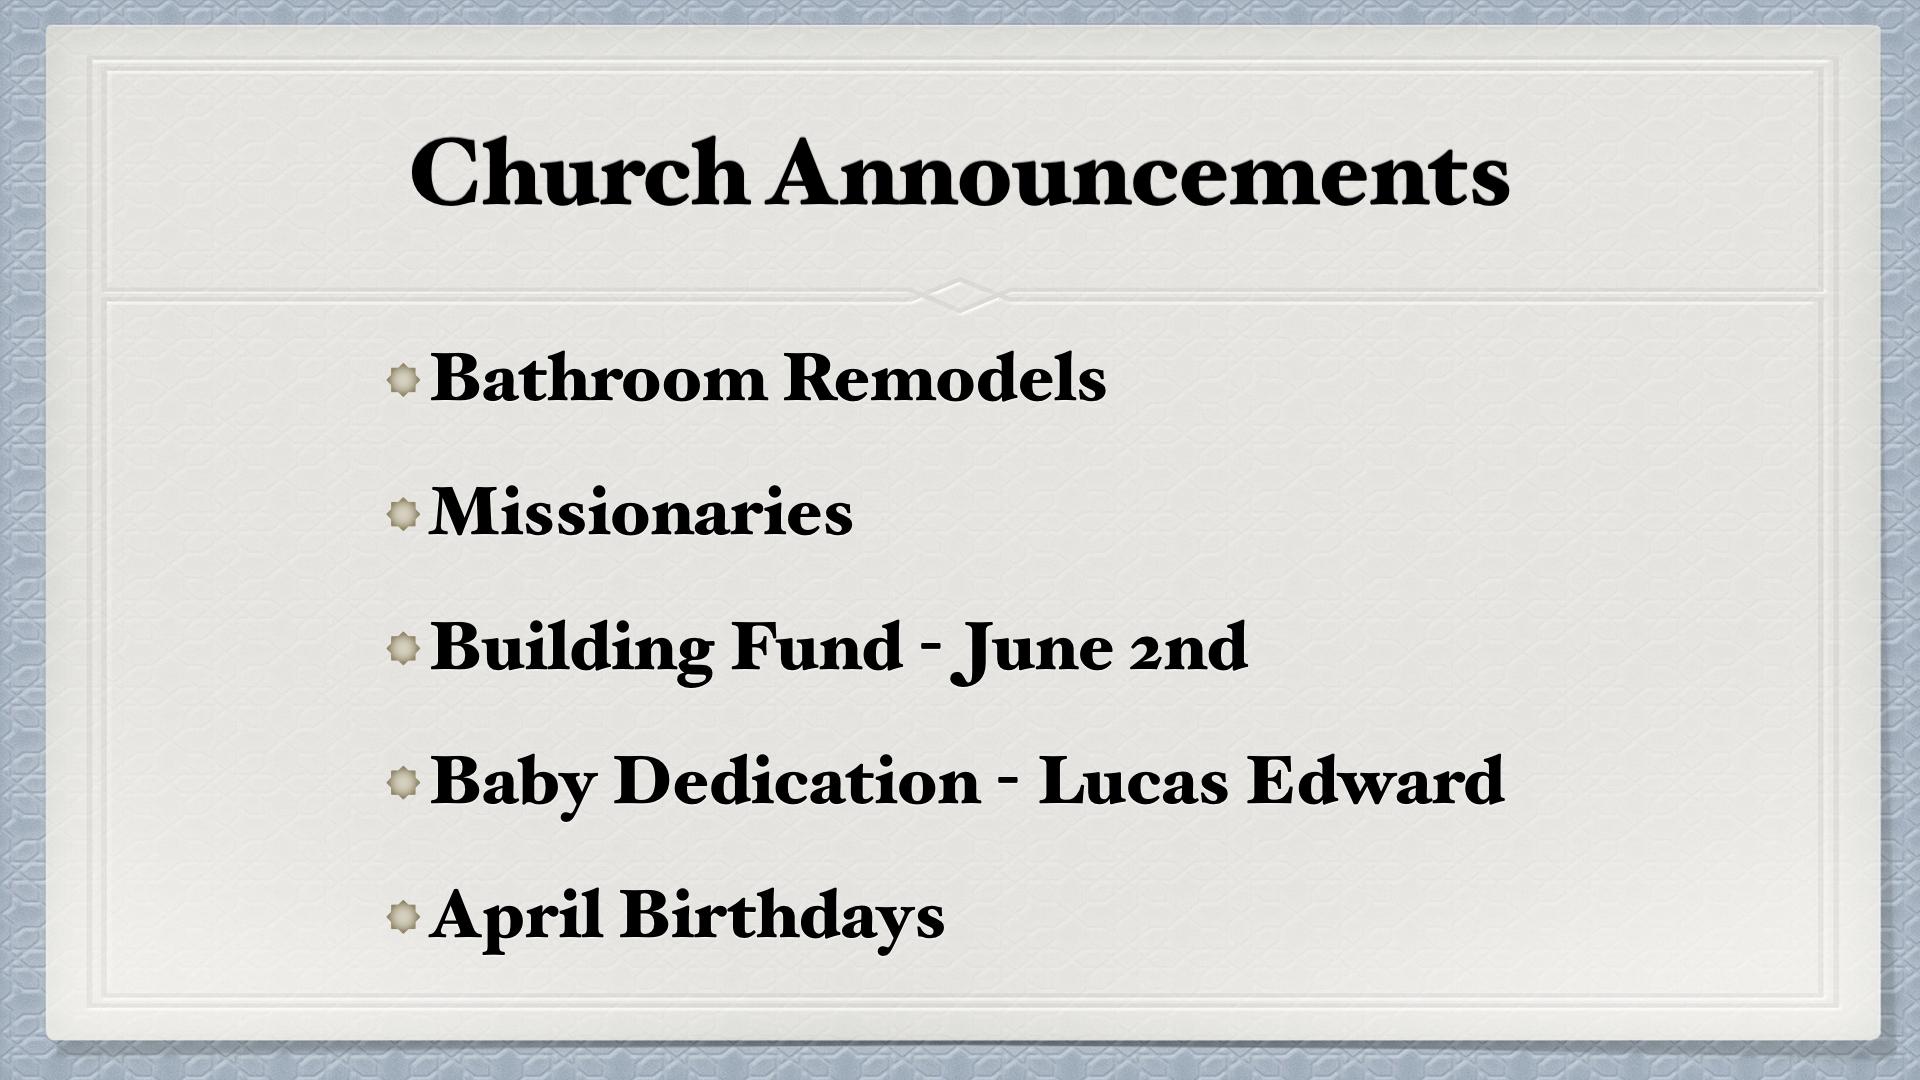 SERMON: April 28, 2019 — Trinity Christian Fellowship